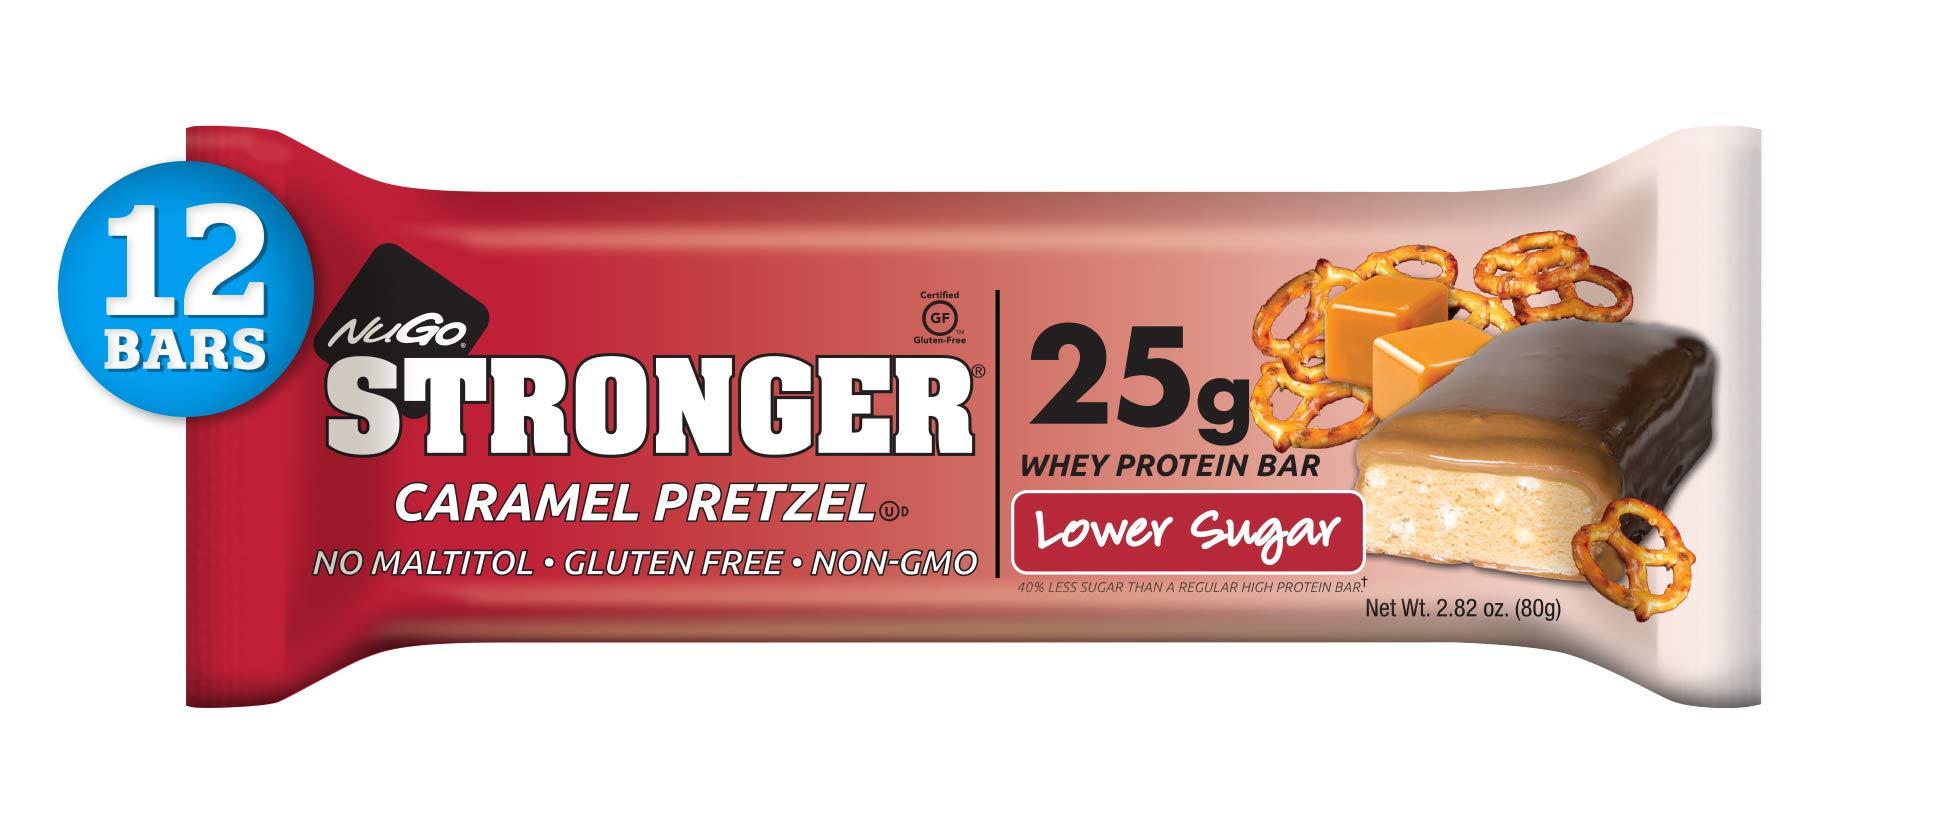 NuGo Stronger Caramel Pretzel, 25g Whey Protein, 10g Fiber, Gluten Free, 12 Count by NuGo